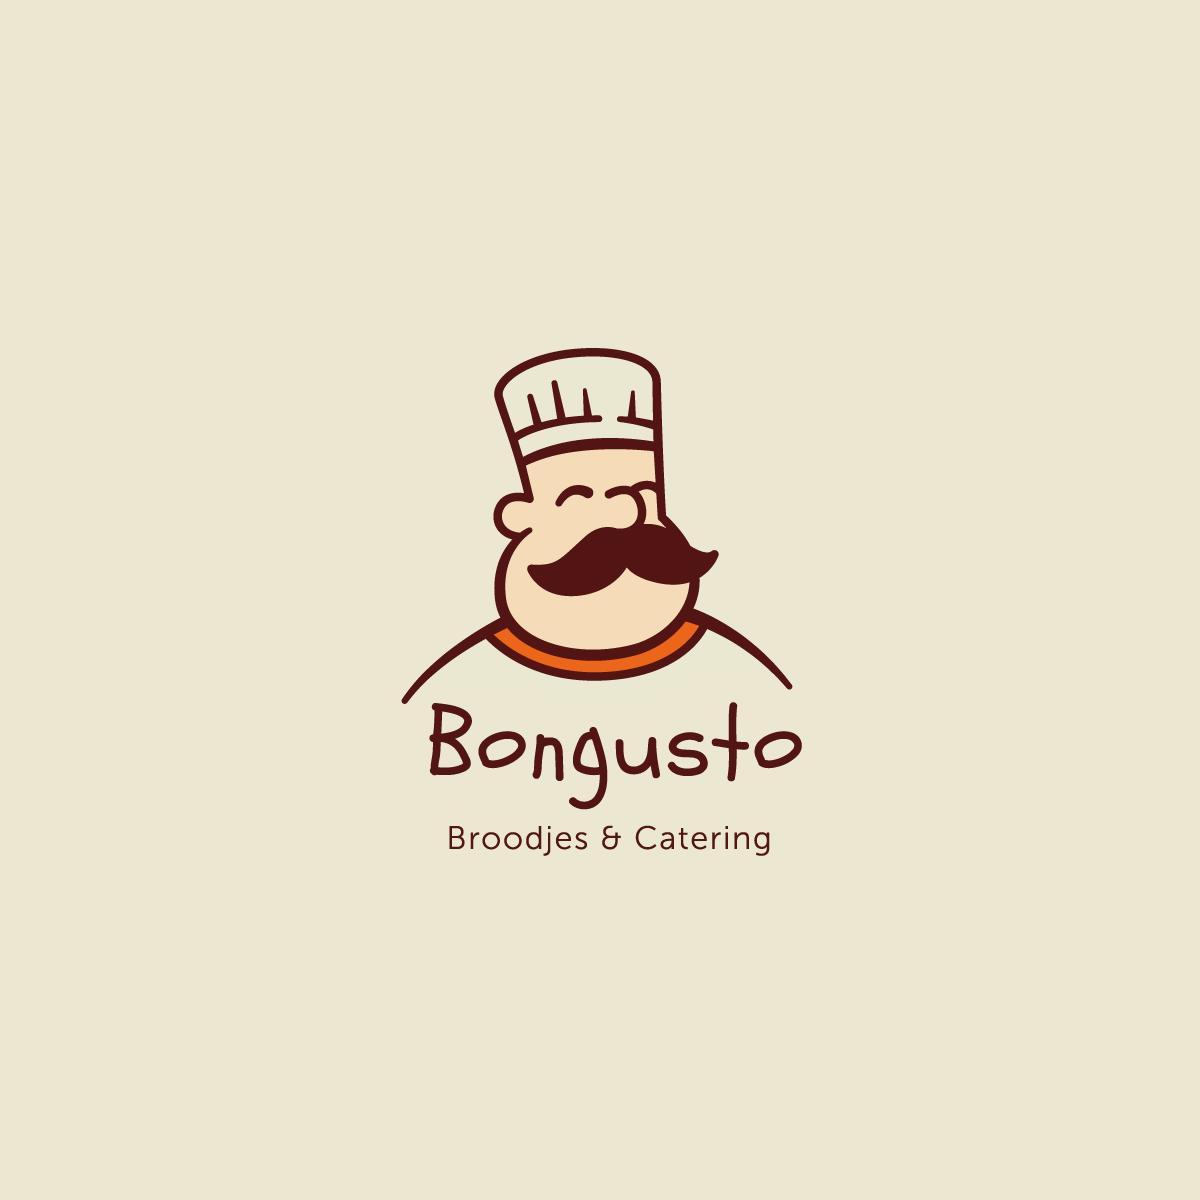 Bongusto-logo-vaslam